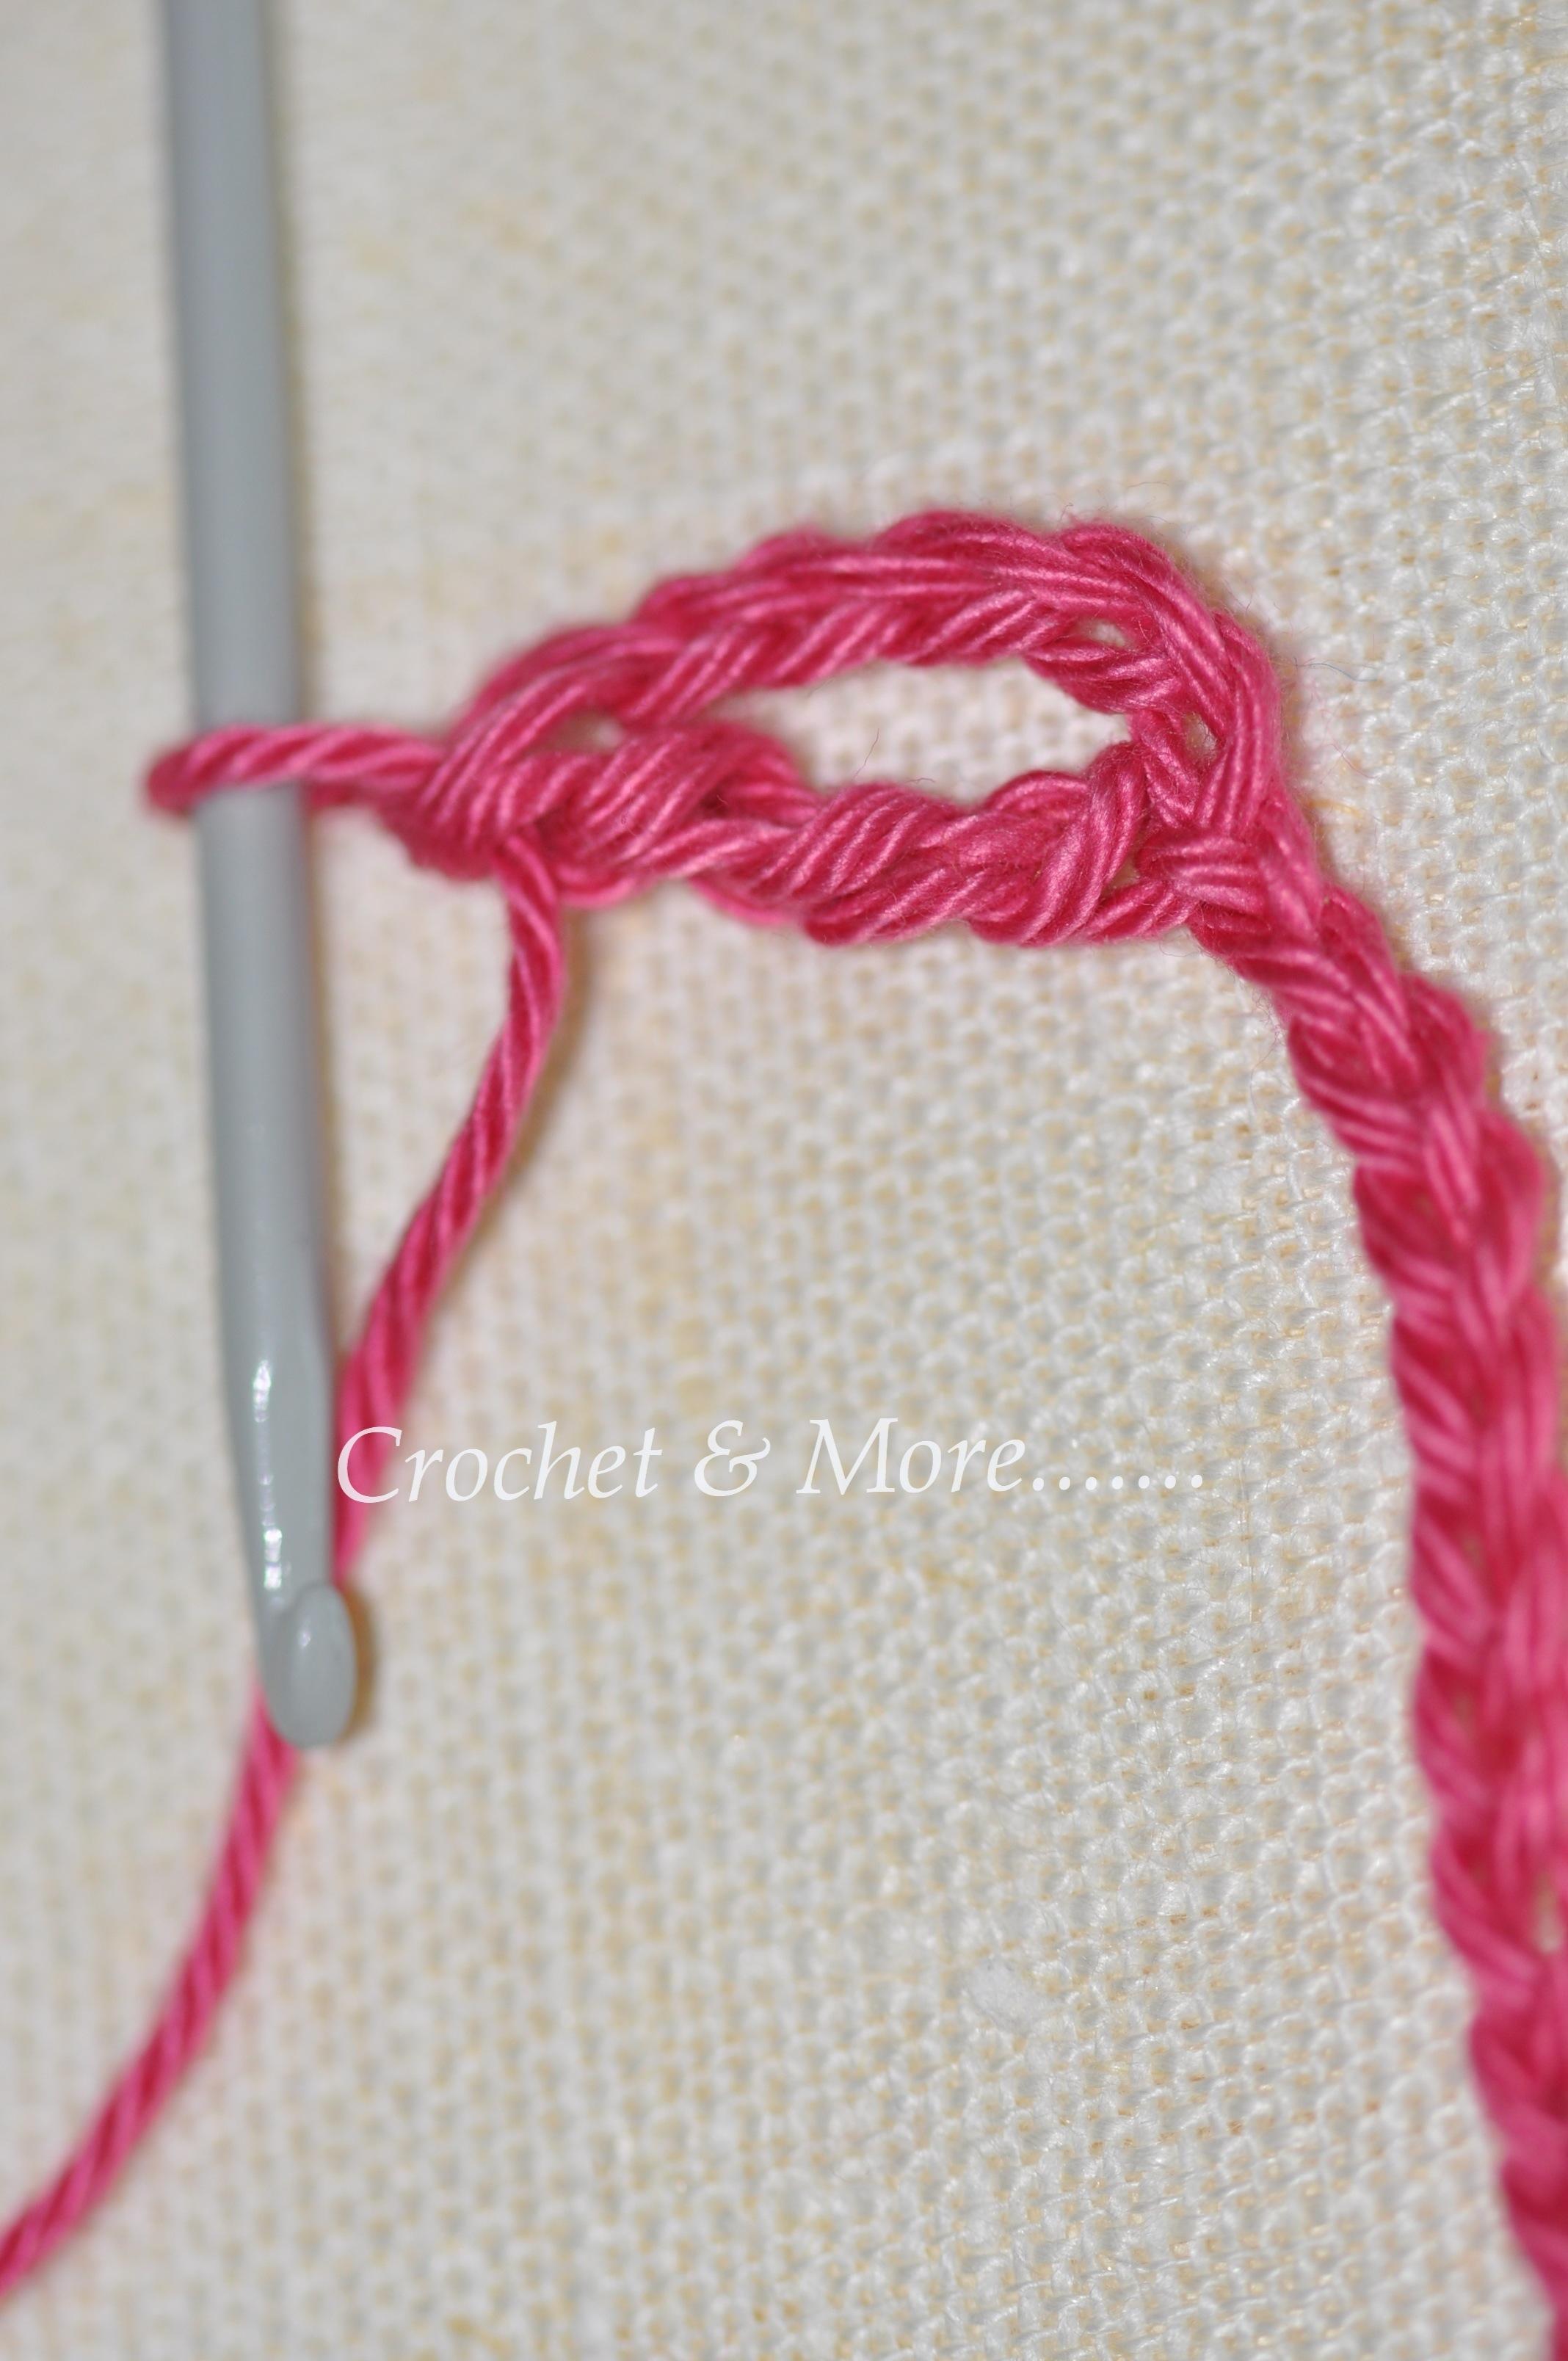 Beginner?s Basic Crochet Stitches - Tr and dtr crochetnmore